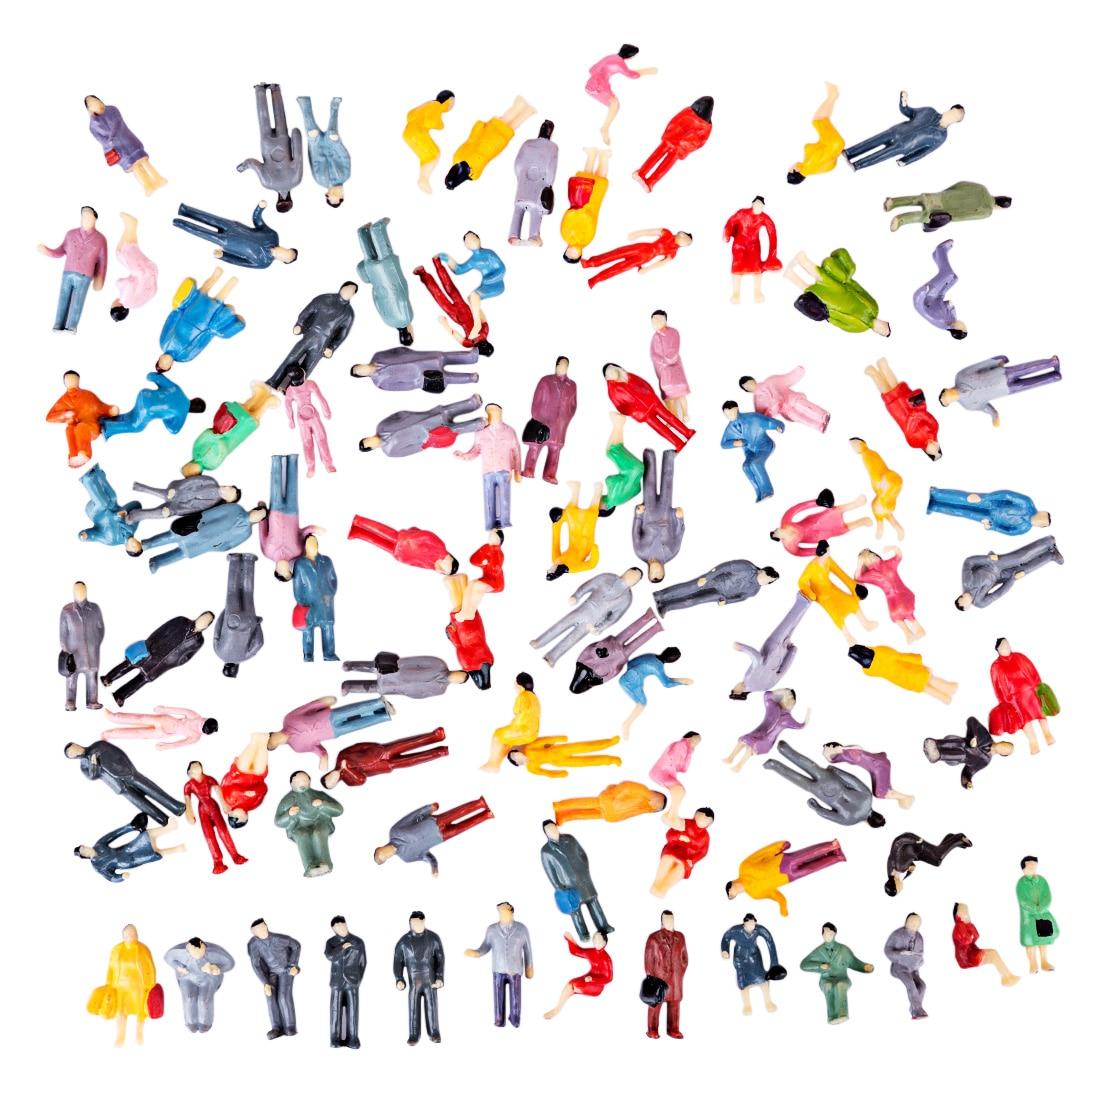 50/100Pcs 1:50/75 /87/100/150 HO Scale Miniature Figures Model for Train Railway Sand Table - Colorful (Random Type)